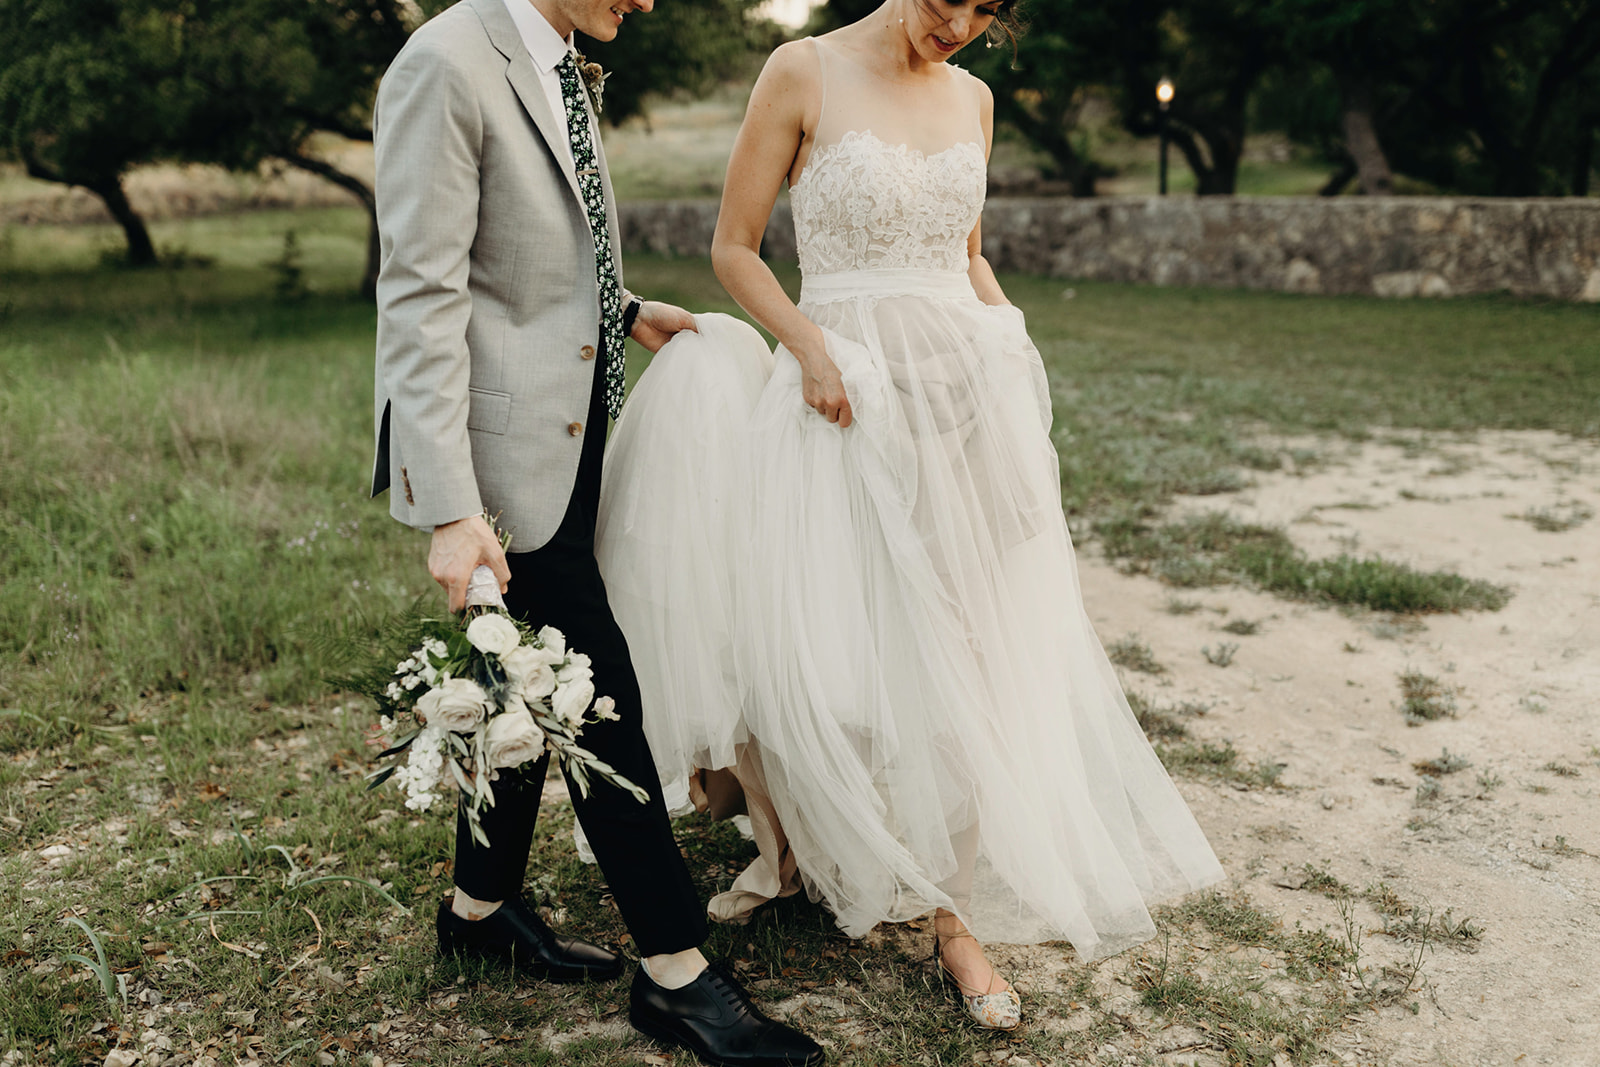 austin-wedding-lindsey-bryce-545.jpg